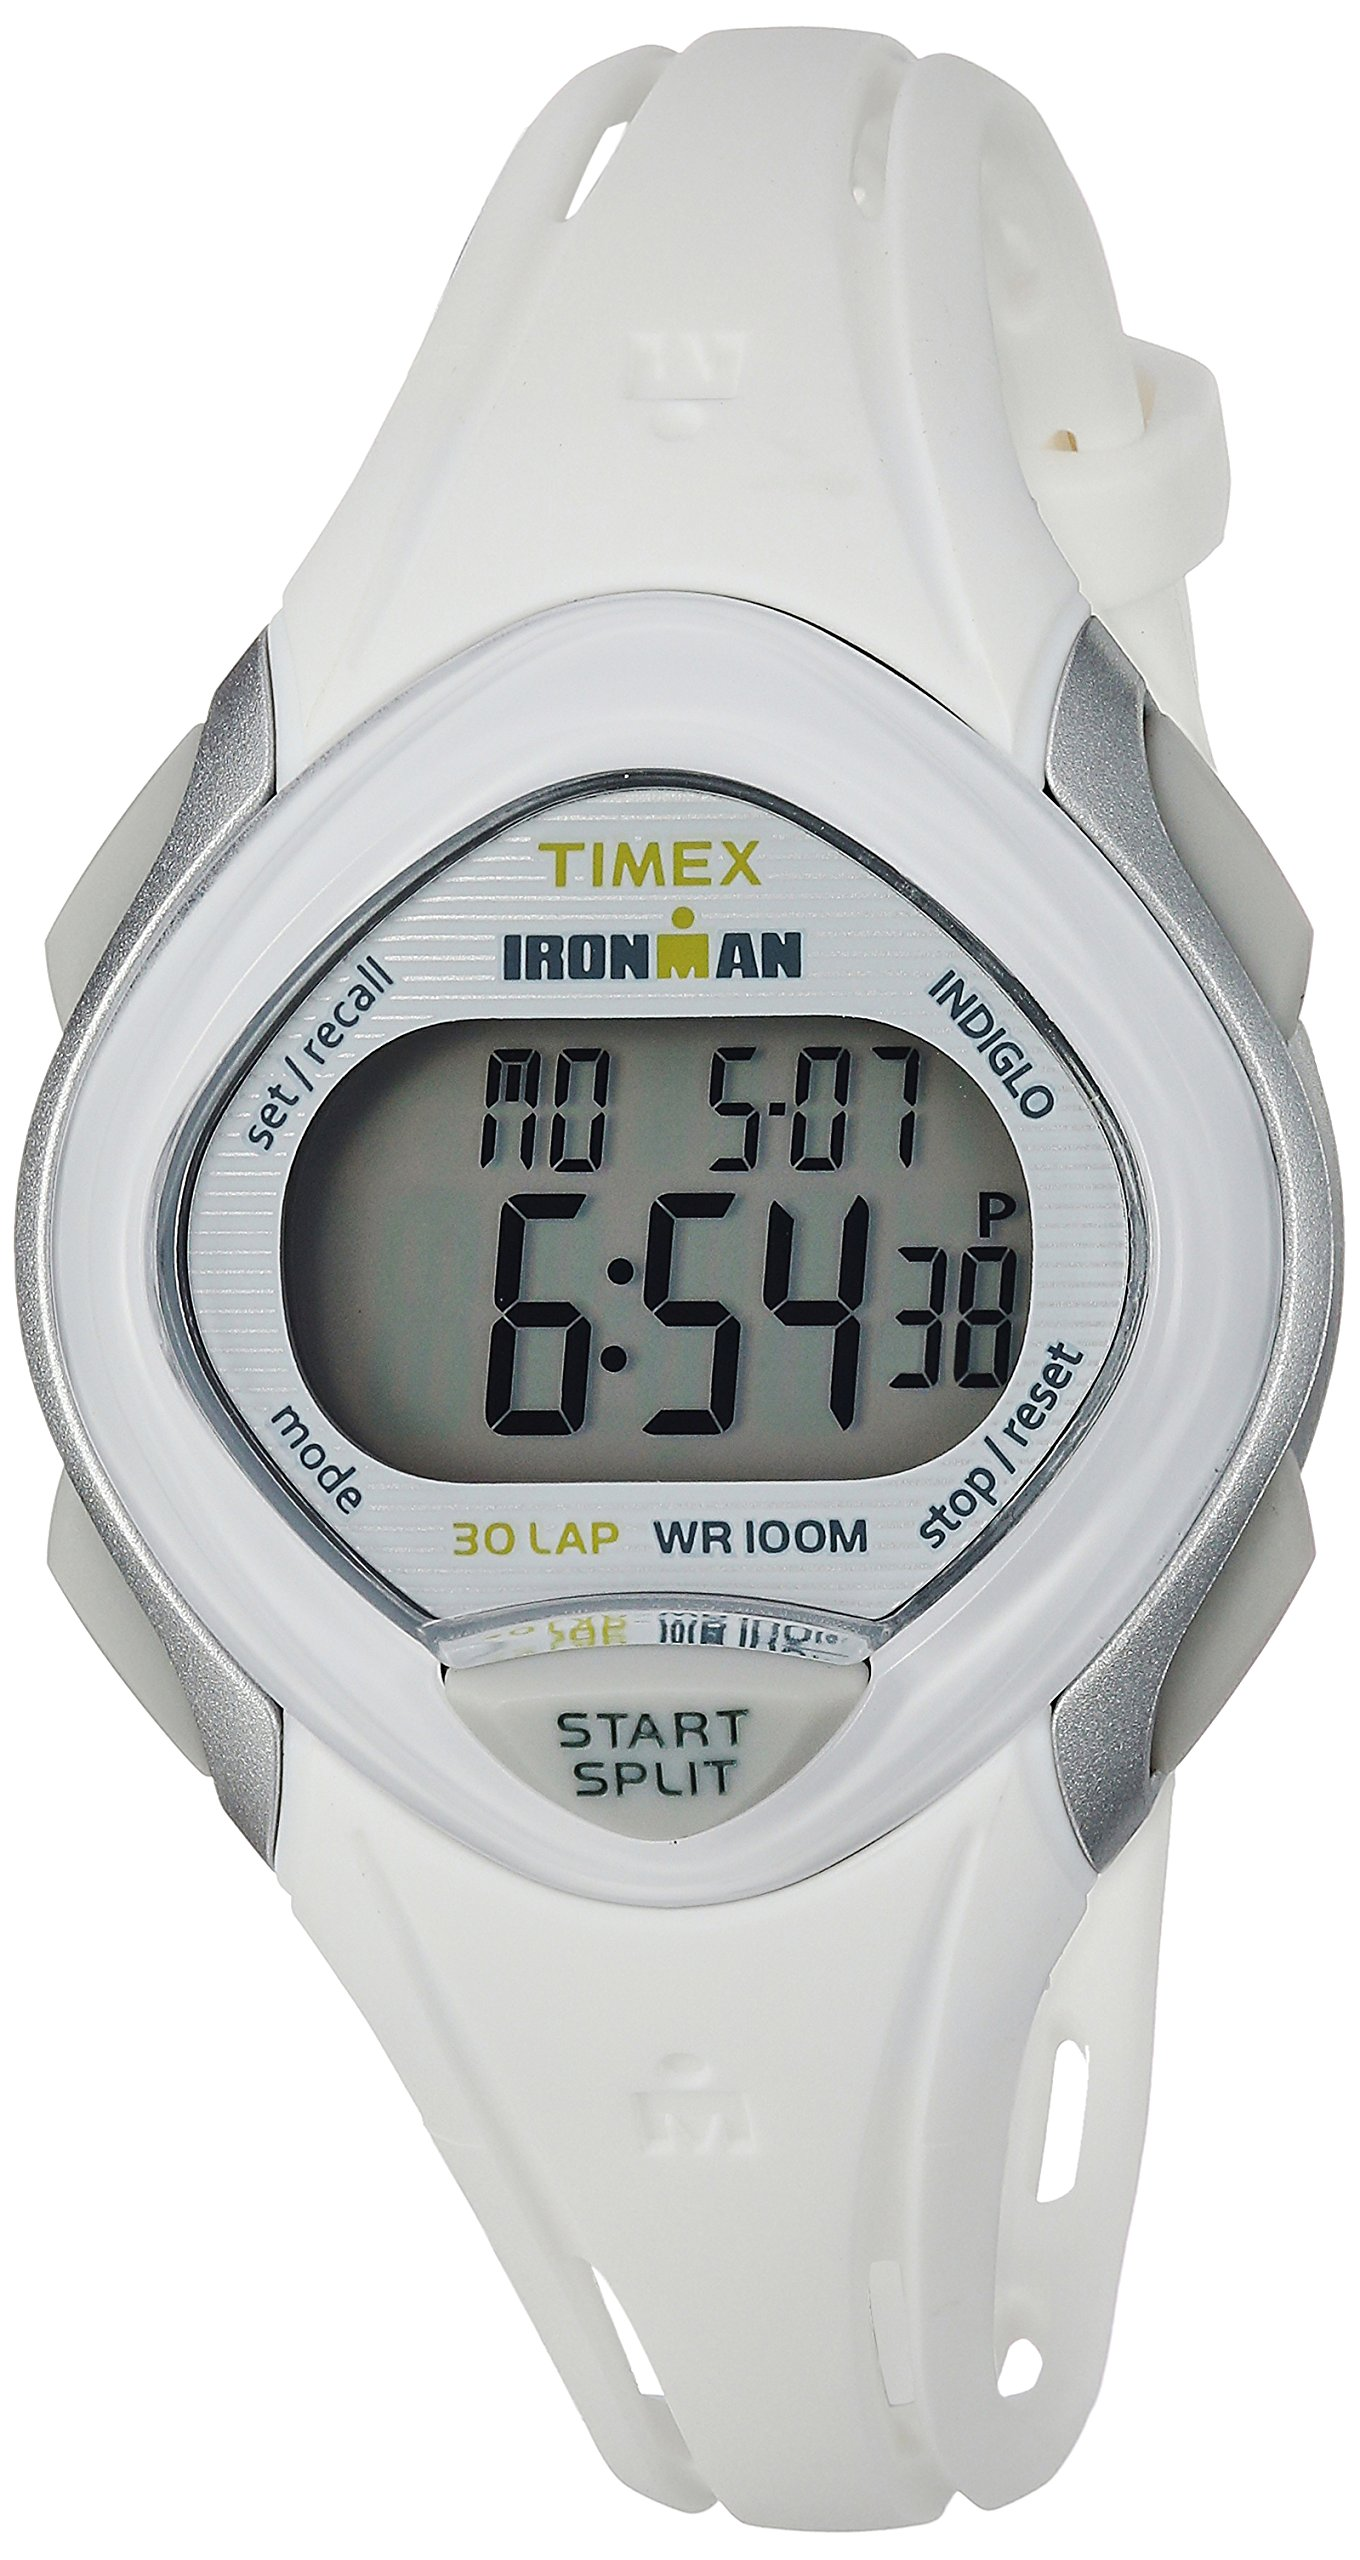 Timex Women's TW5M12400 Ironman Sleek 30 White Resin Strap Watch by Timex